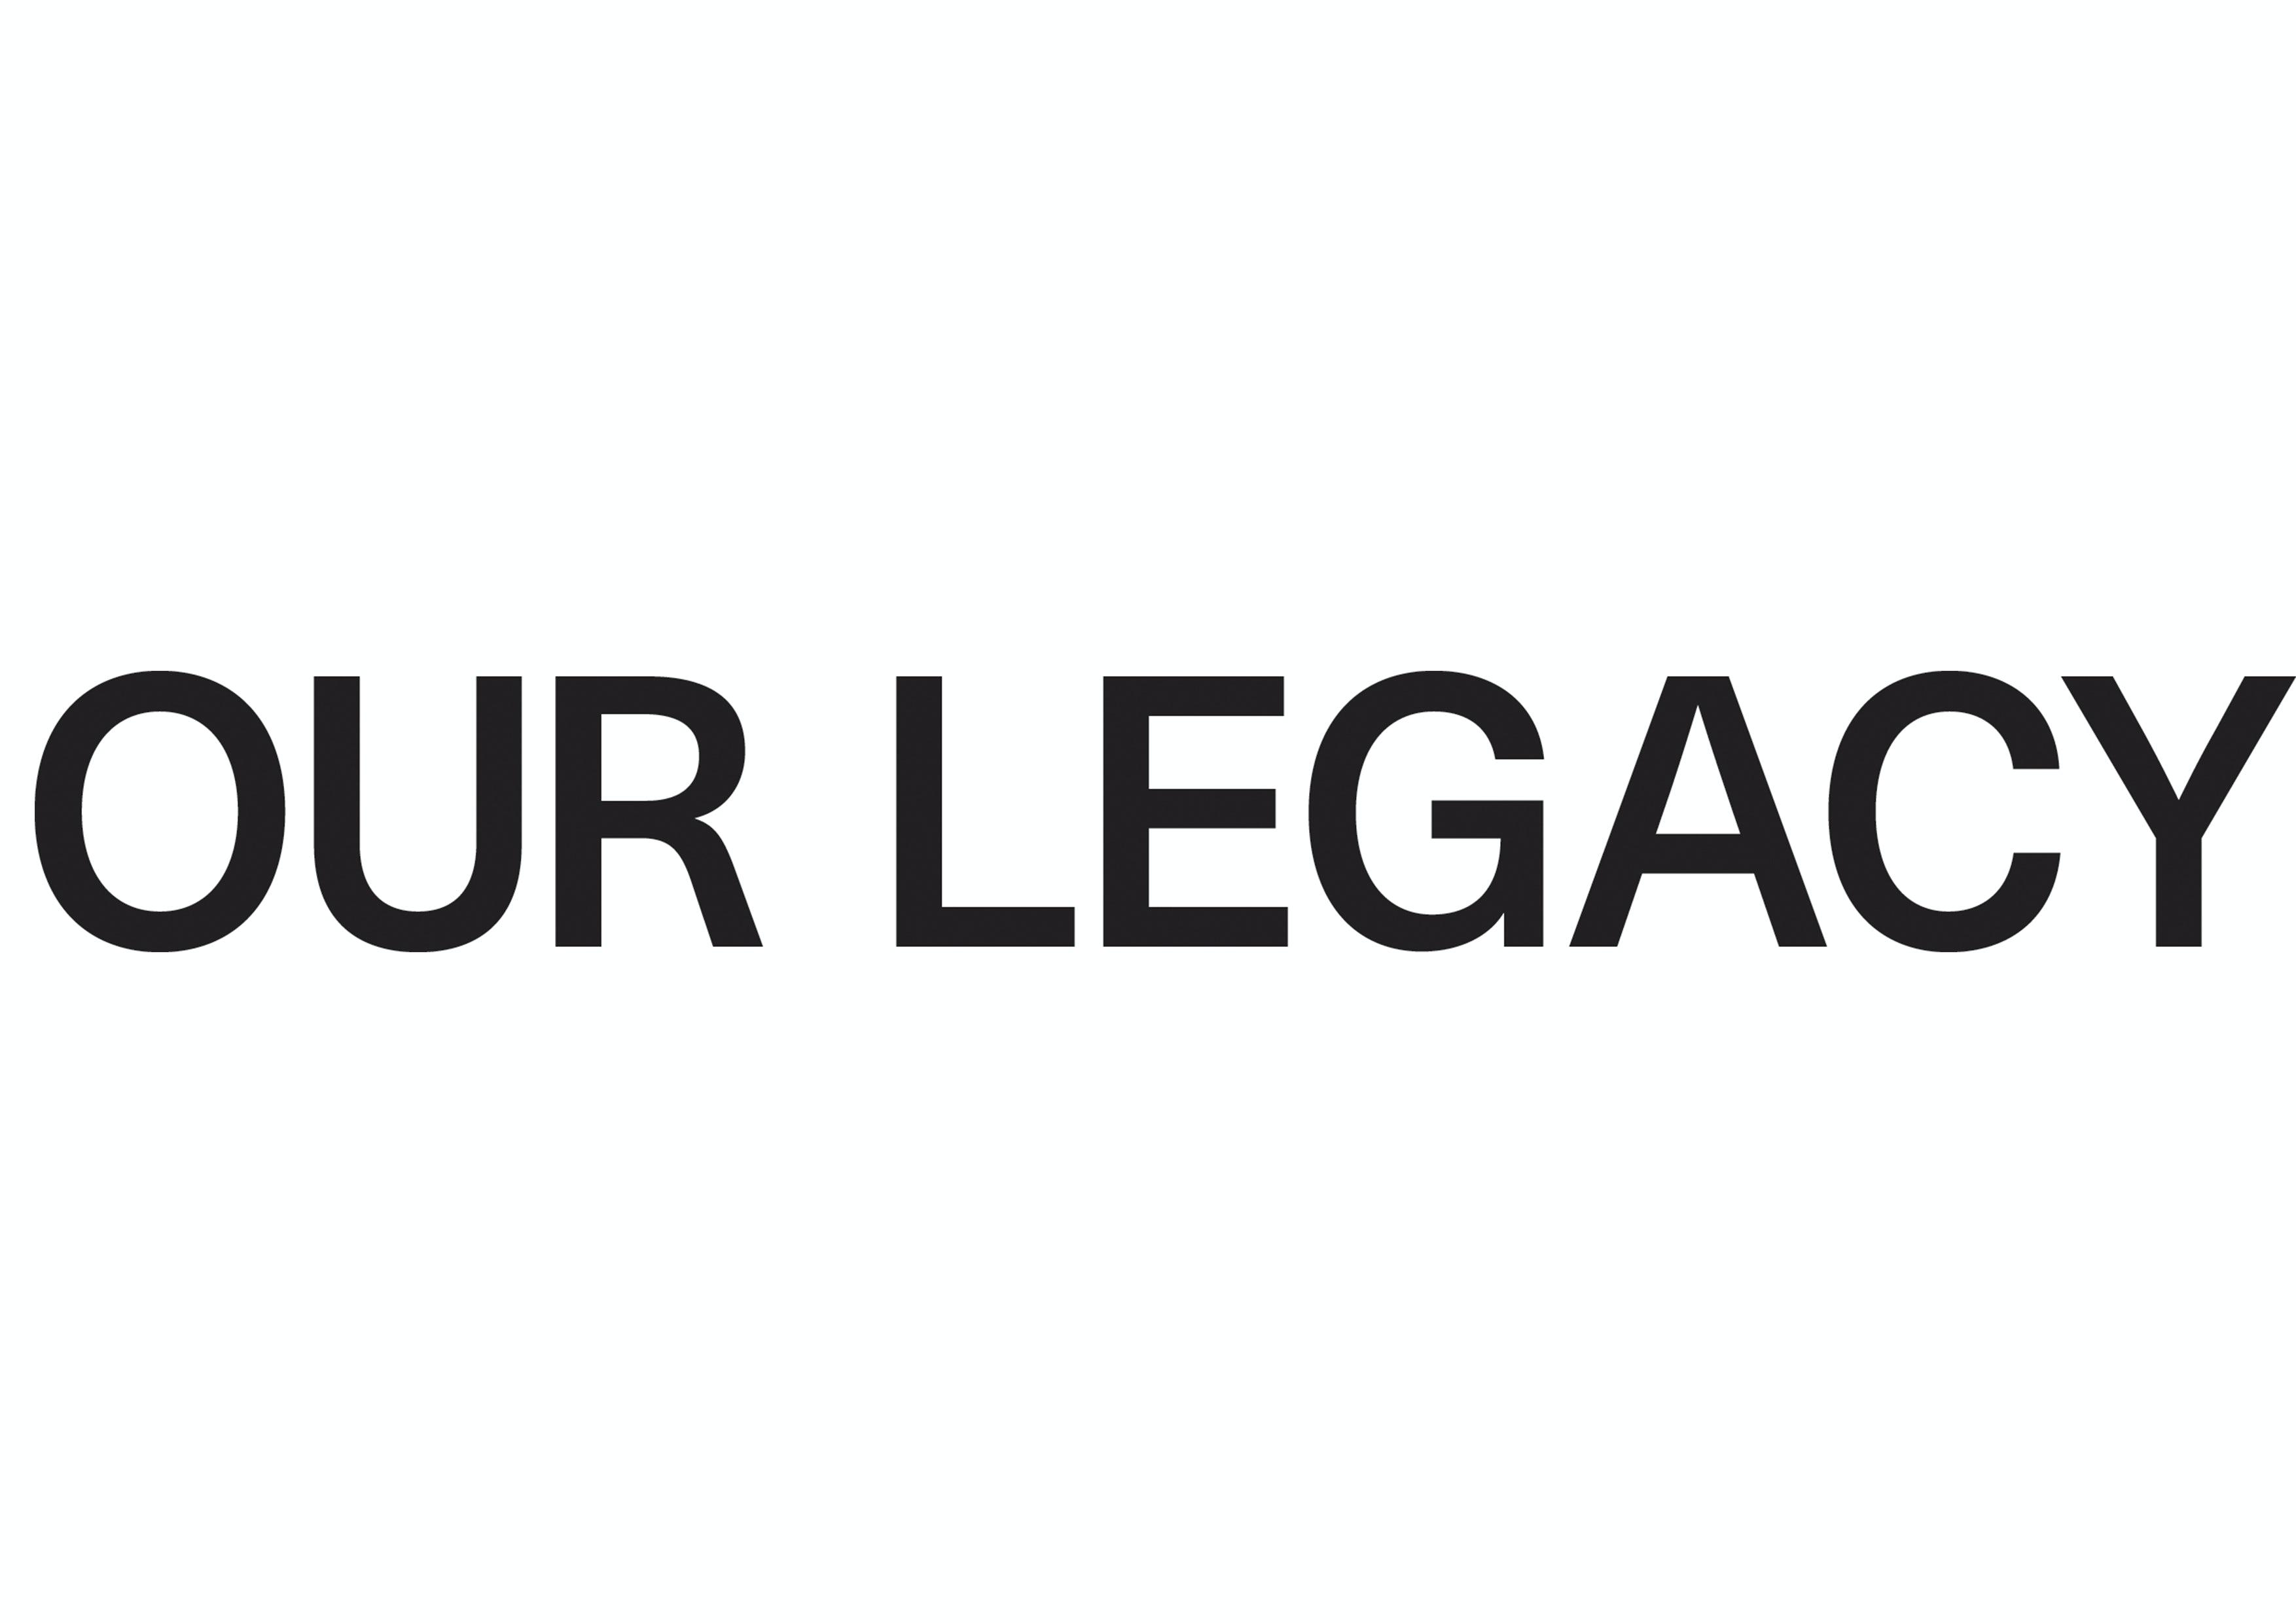 Our Legacy company logo